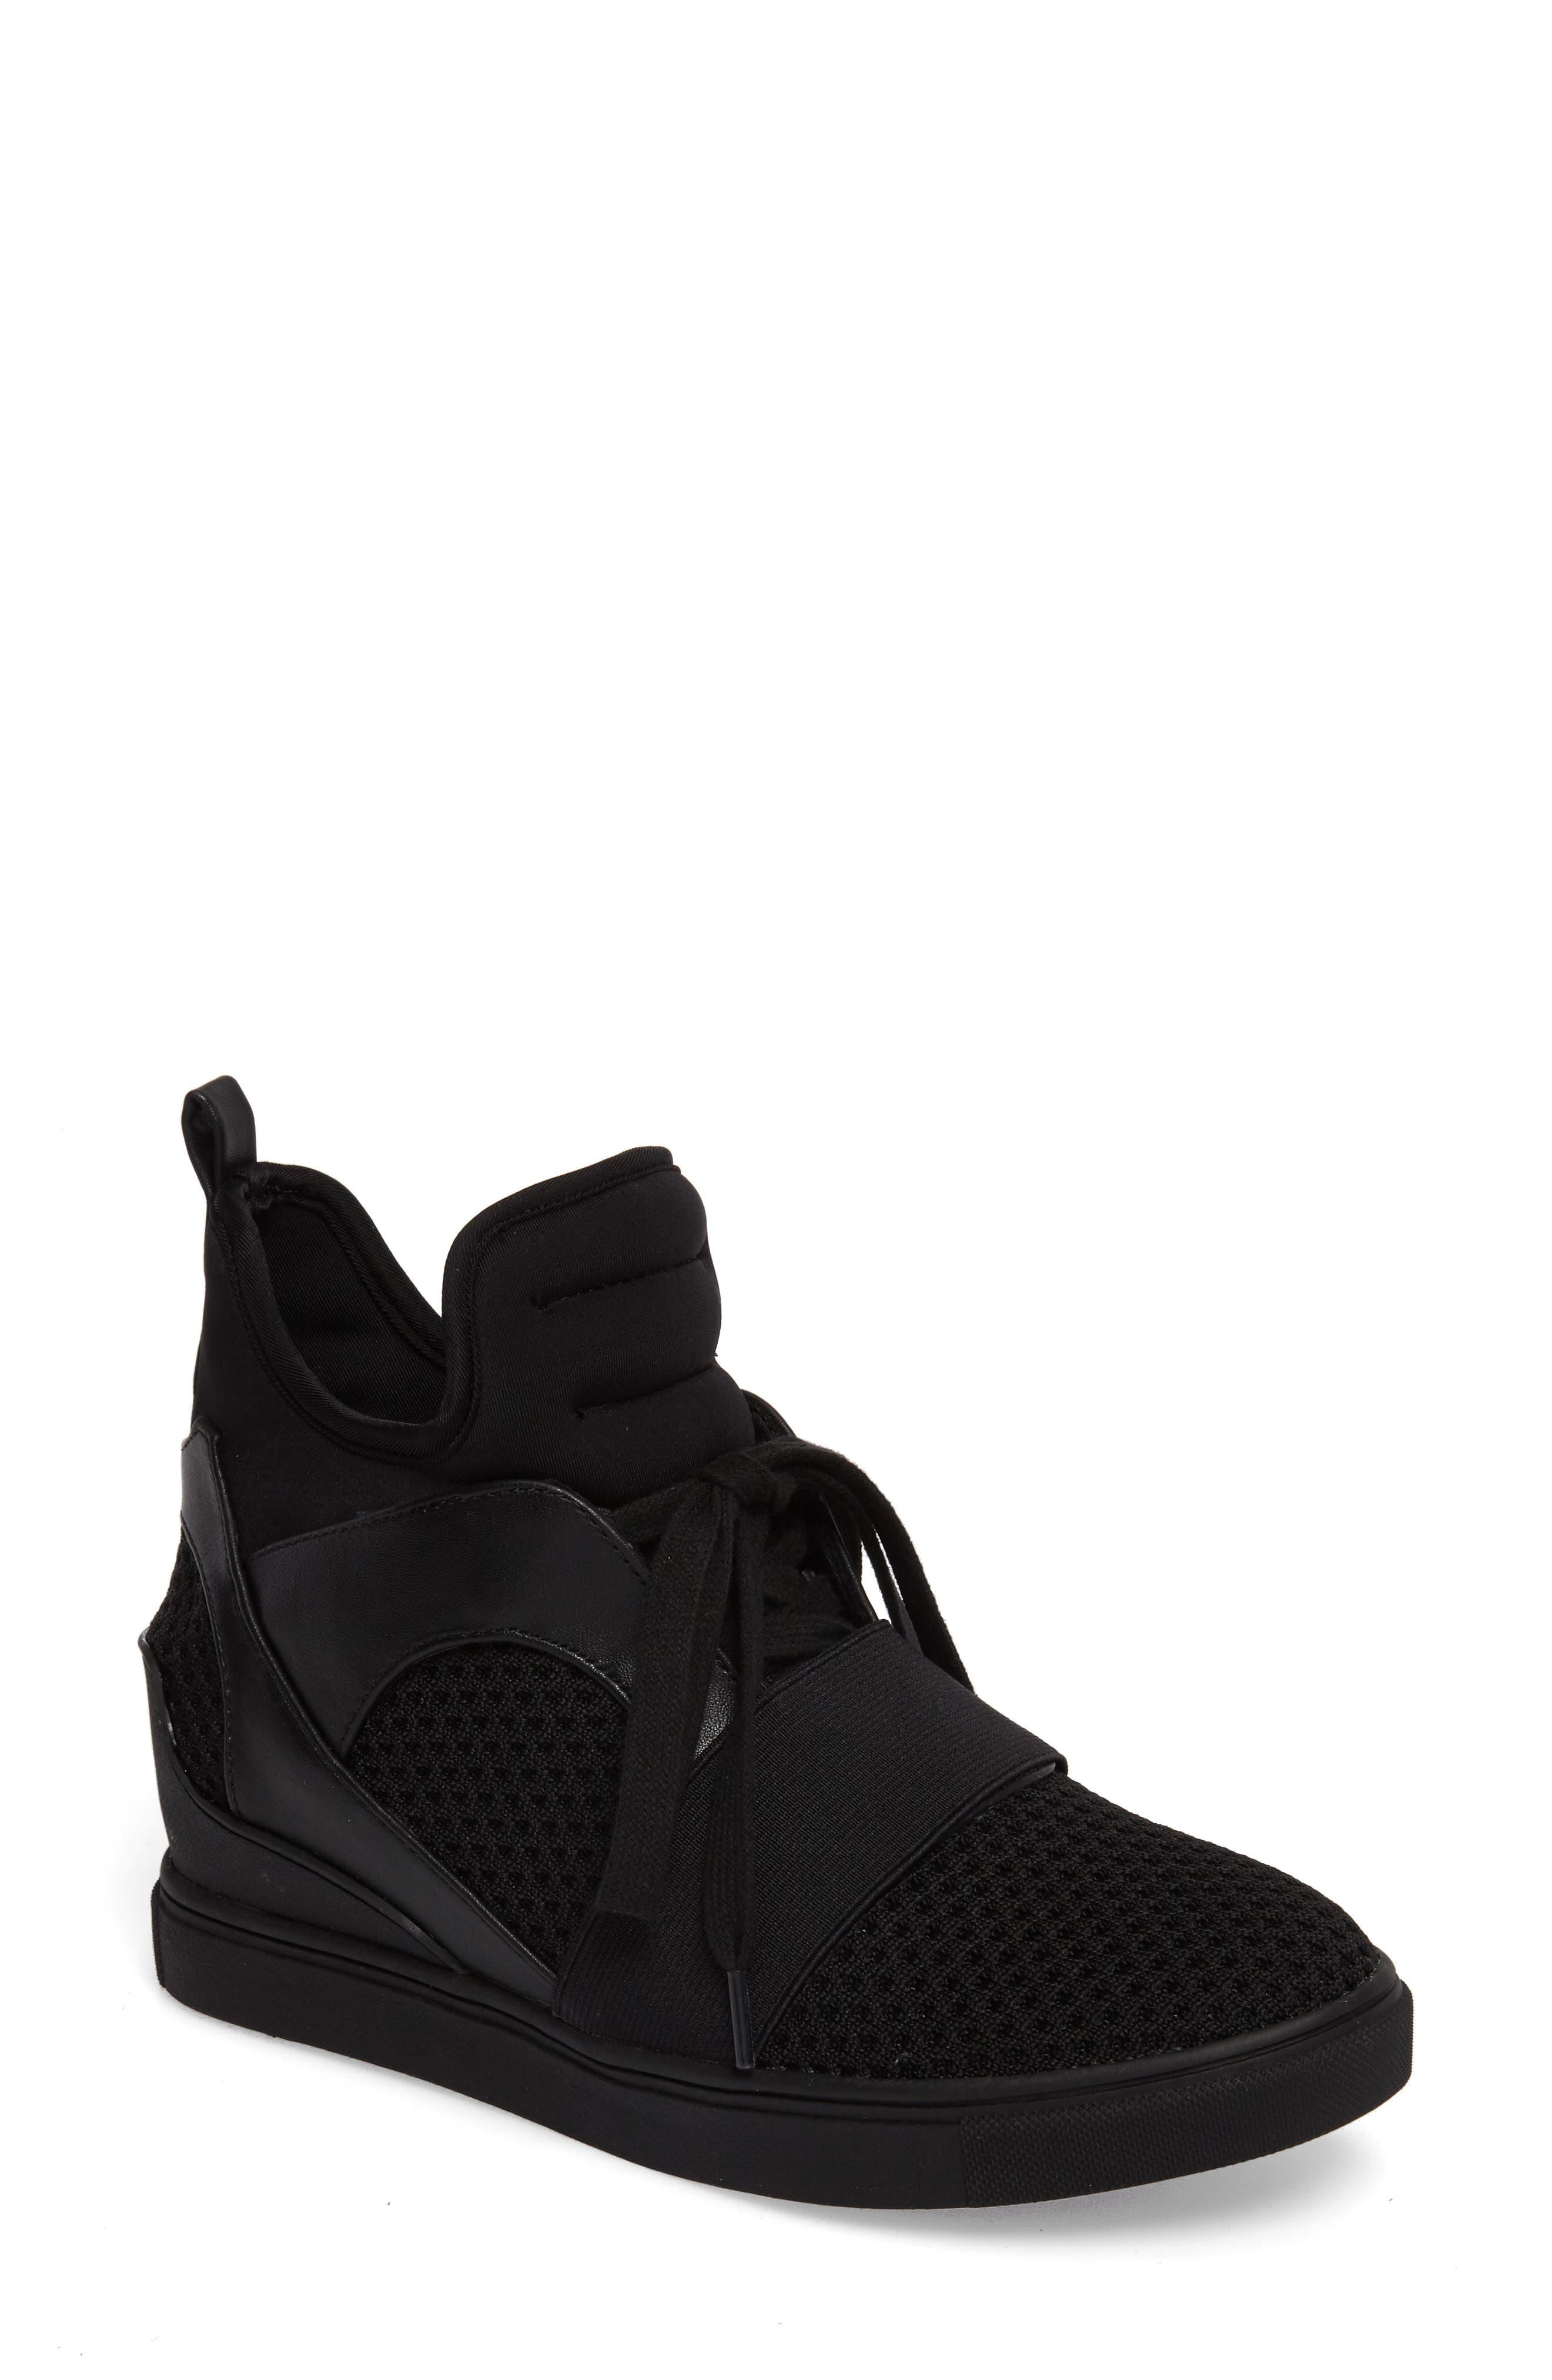 Lexie Wedge Sneaker,                         Main,                         color, 001